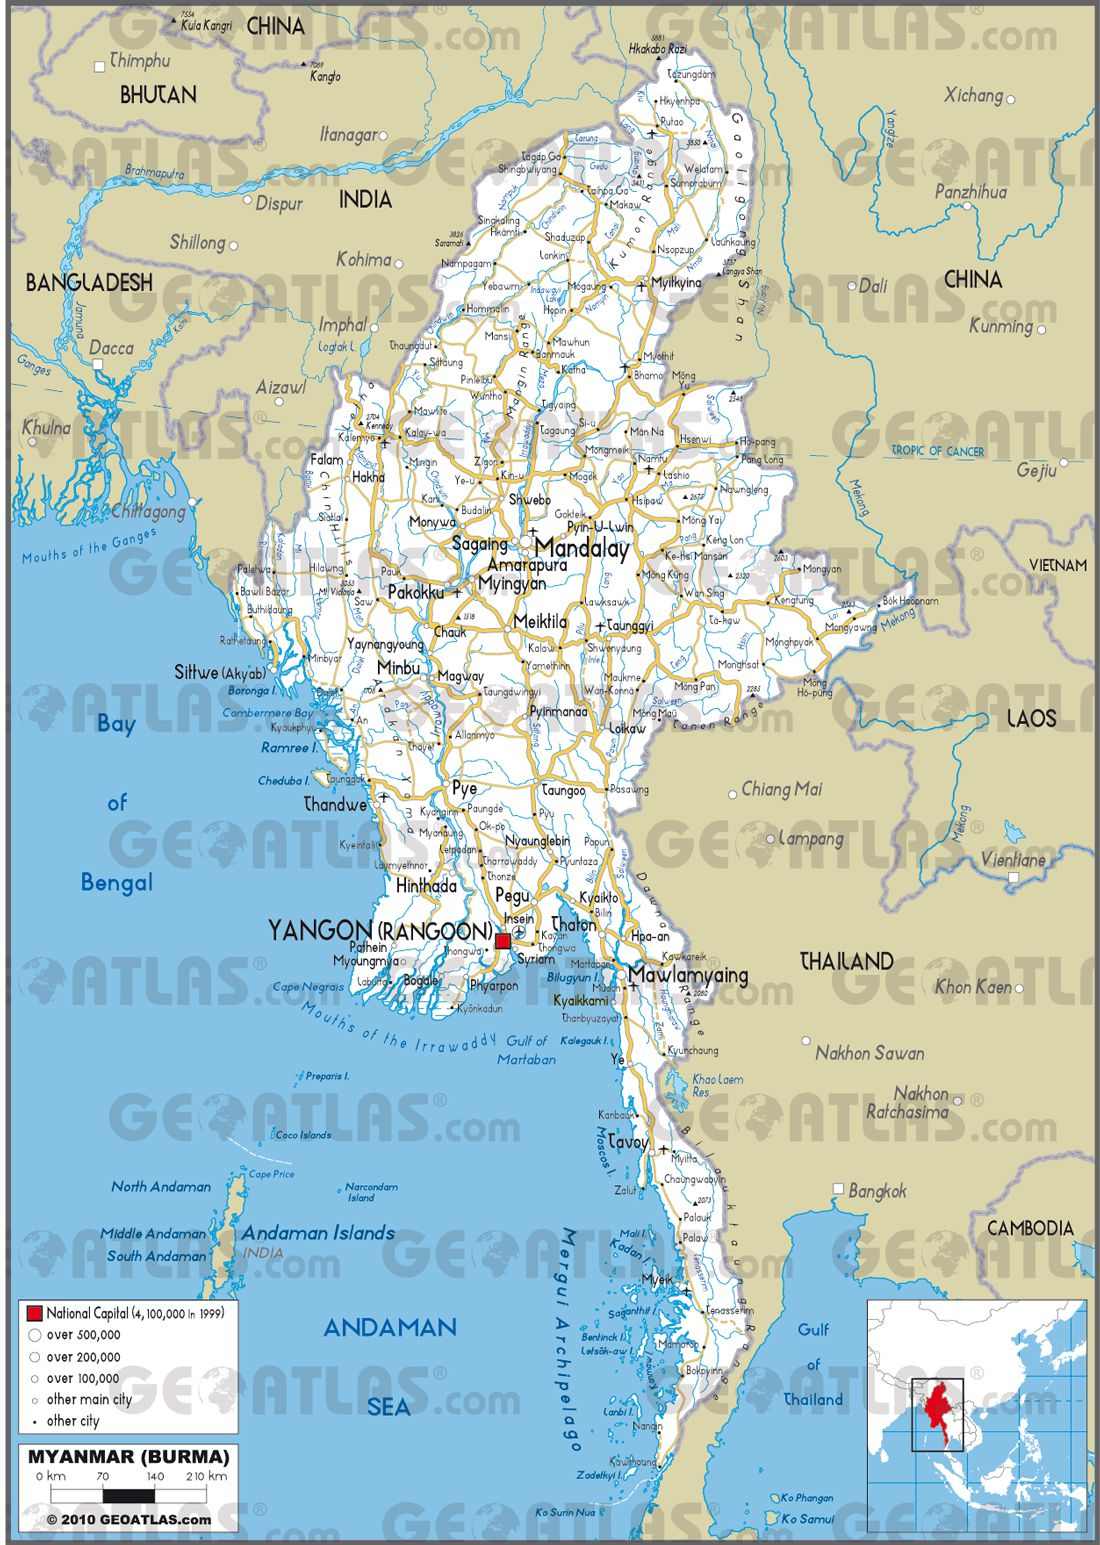 Carte routière de la Birmanie